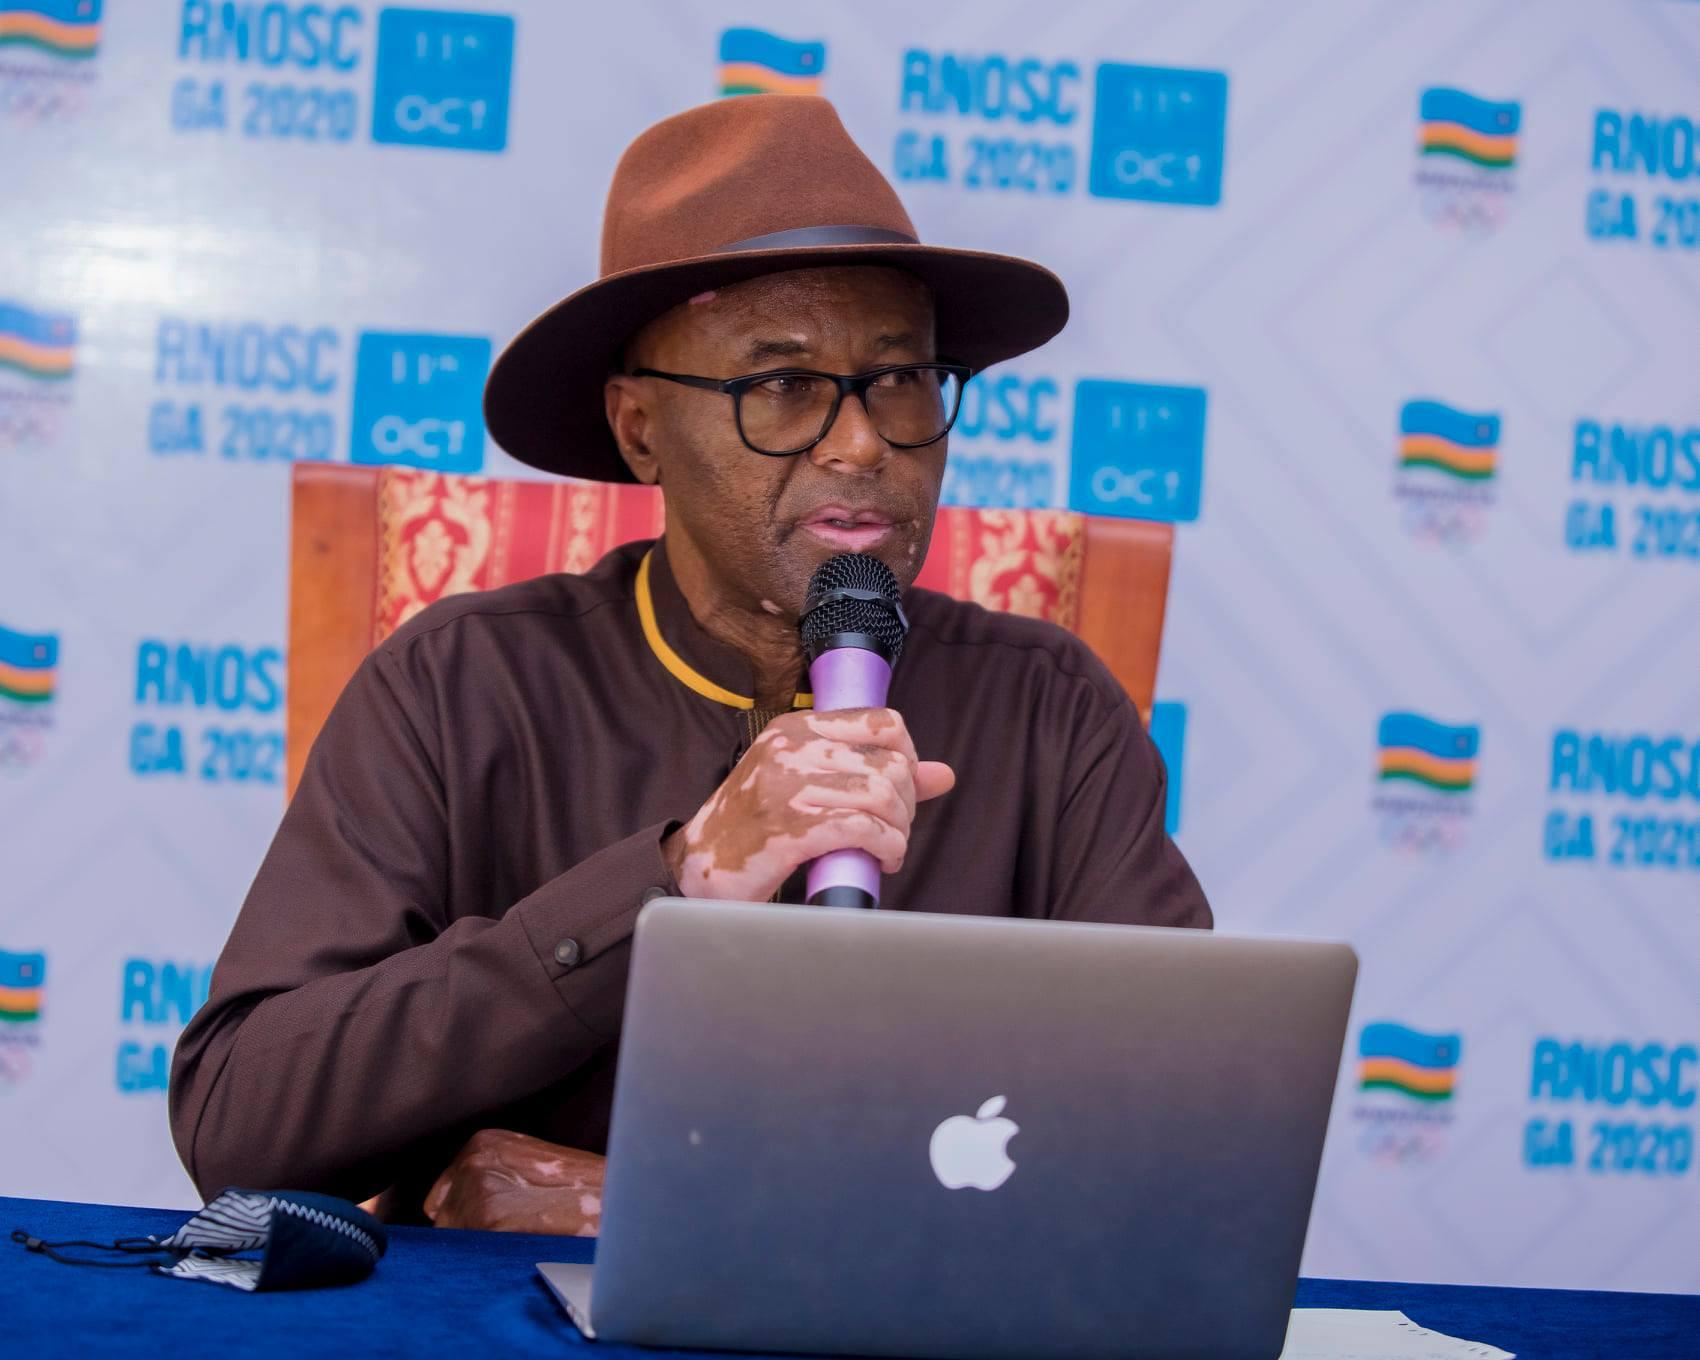 Rwanda NOC confident more athletes will qualify for Tokyo 2020